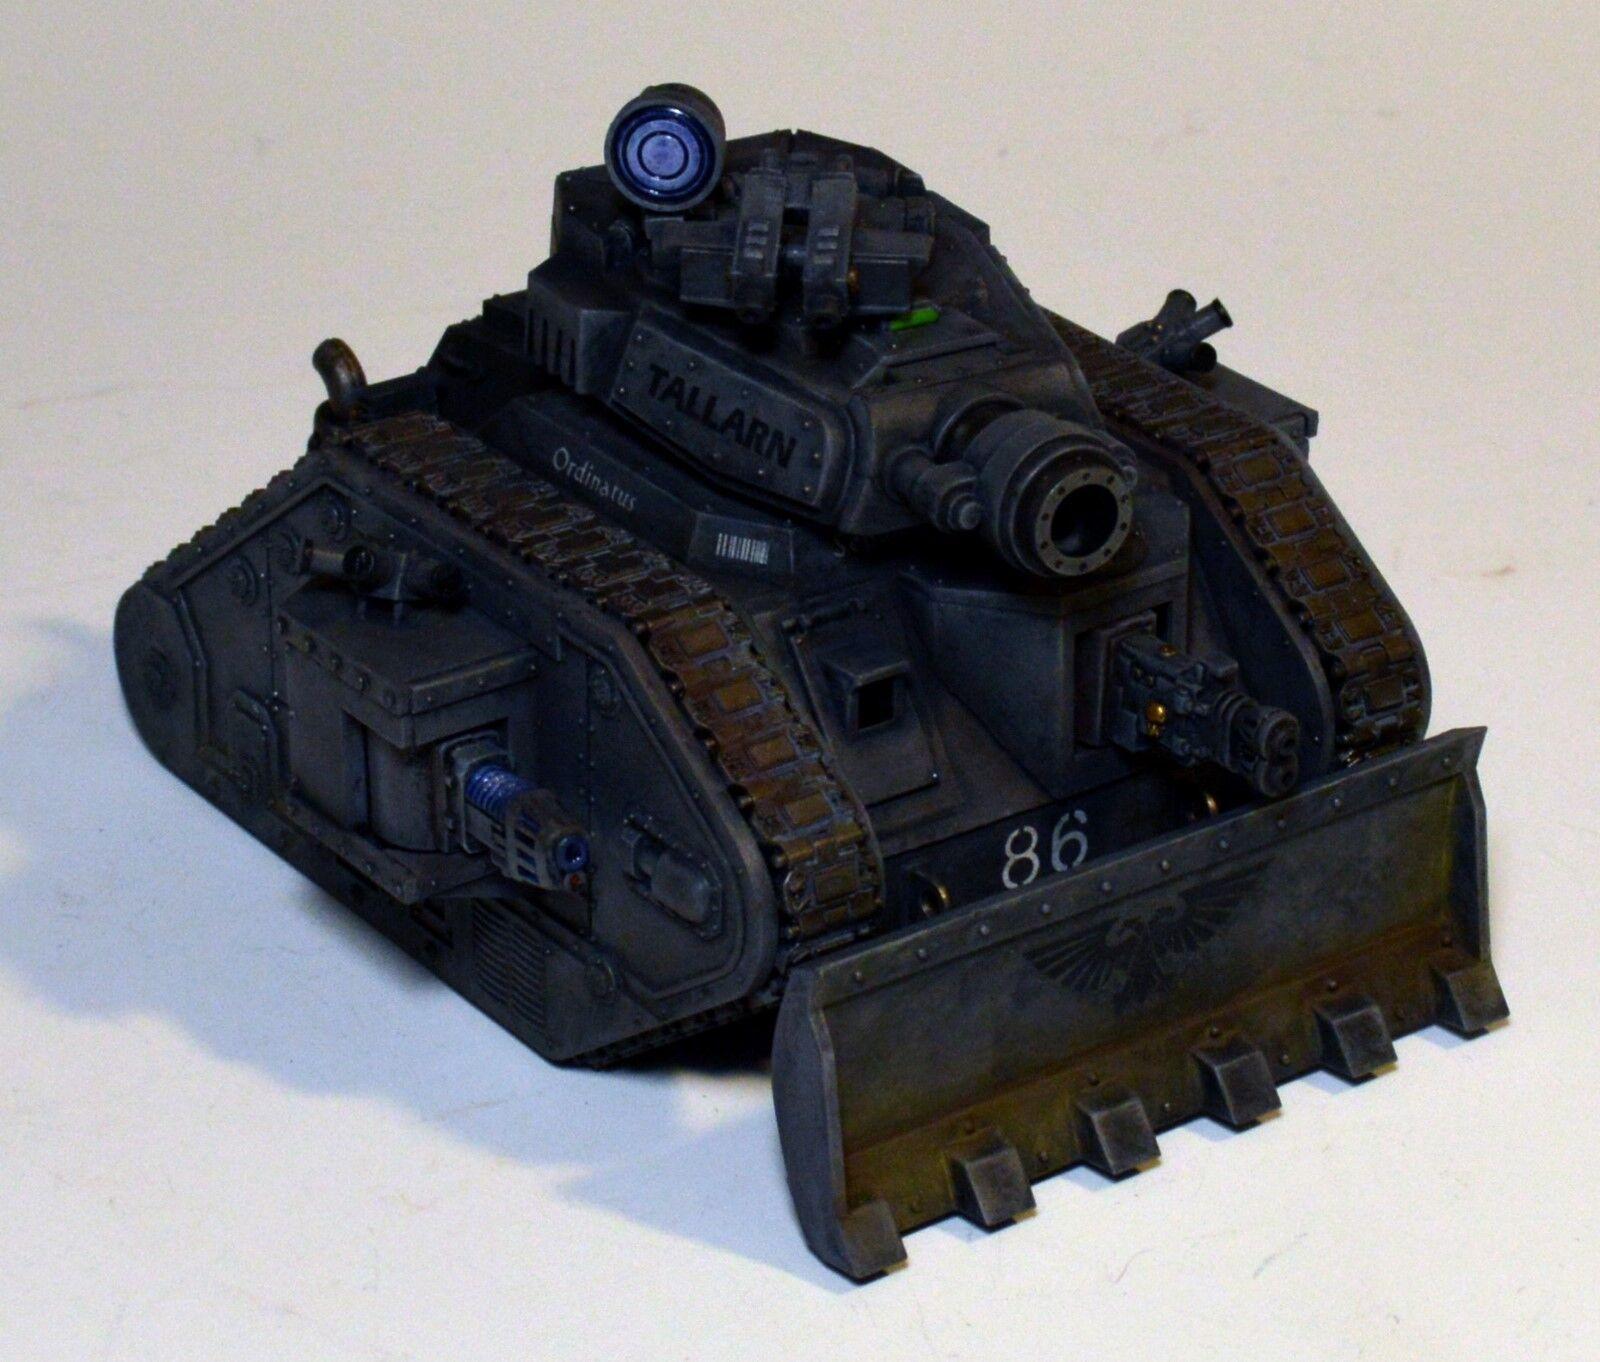 40k Imperial Guard Astra Militarum Leman Russ Demolisher SP